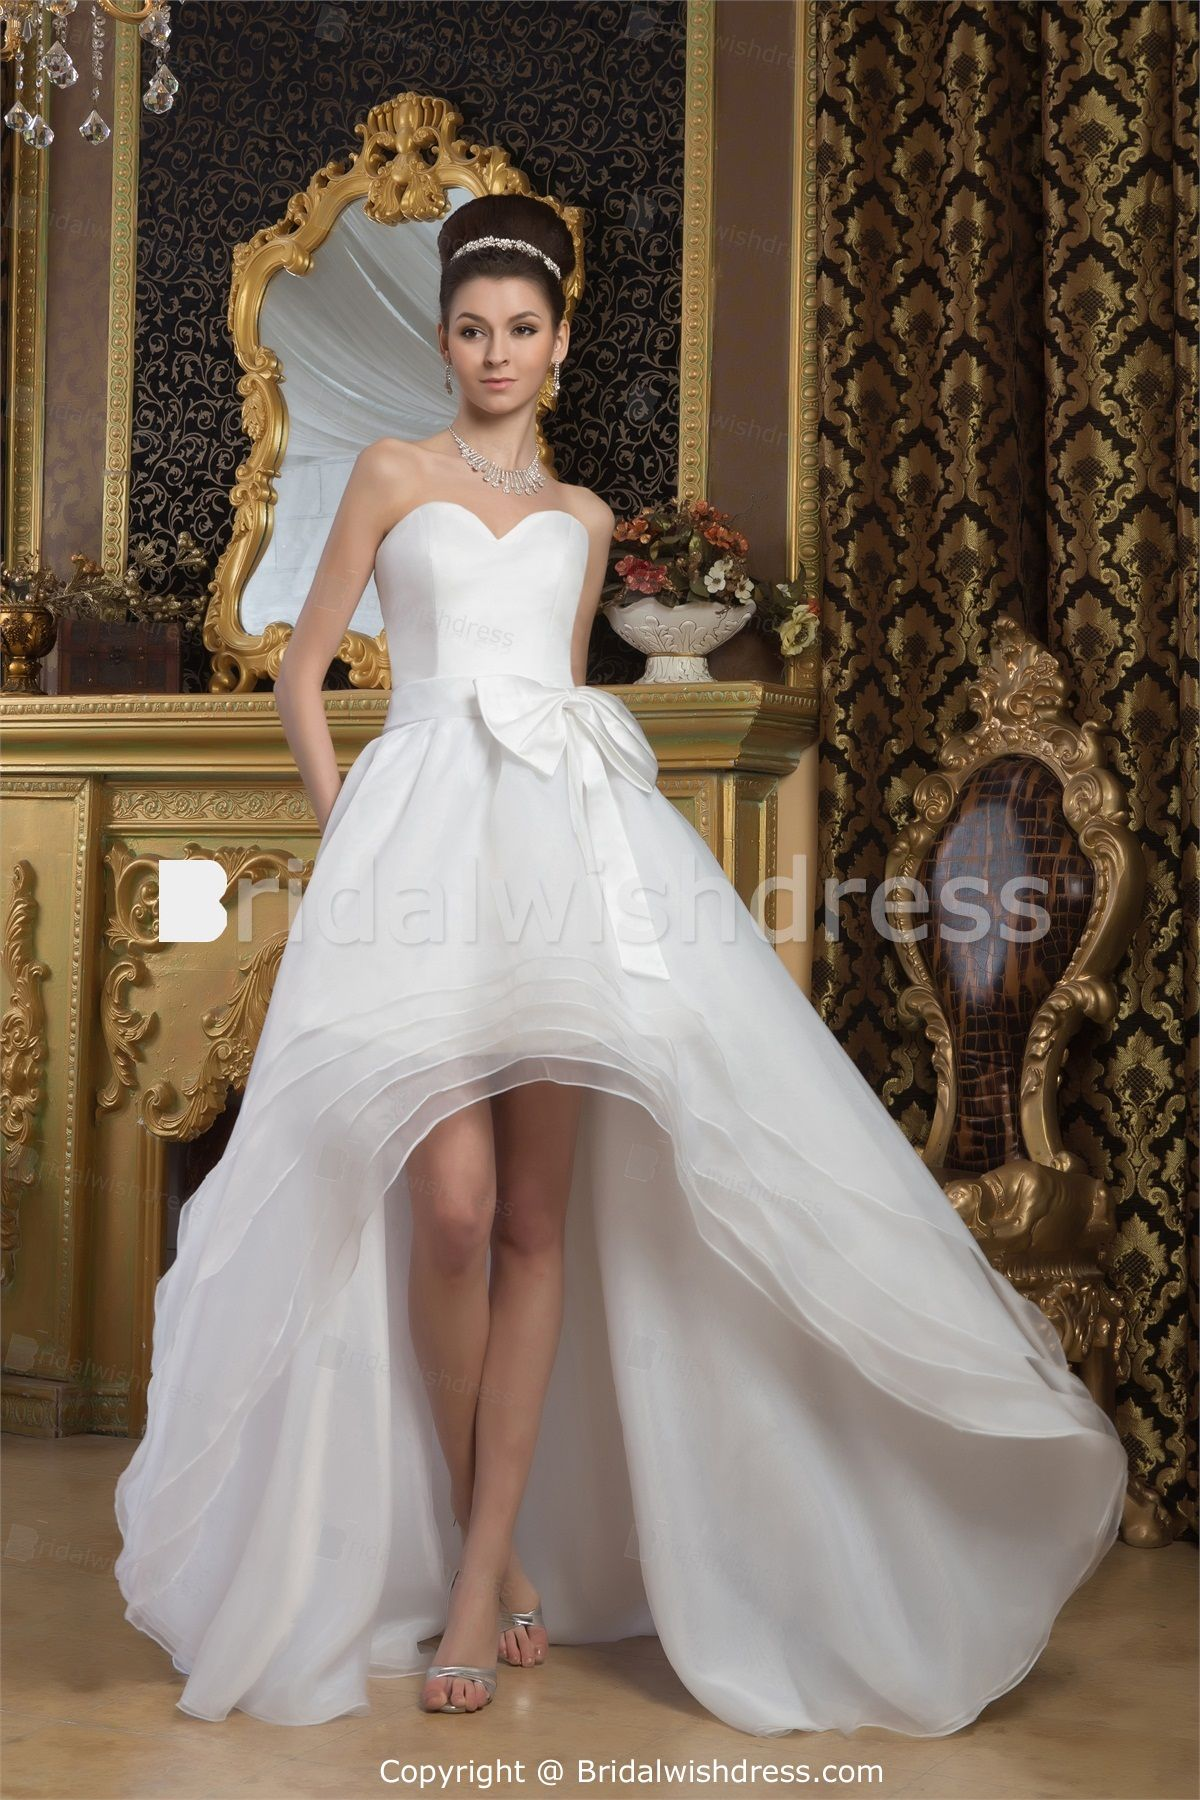 The most beautiful wedding dress